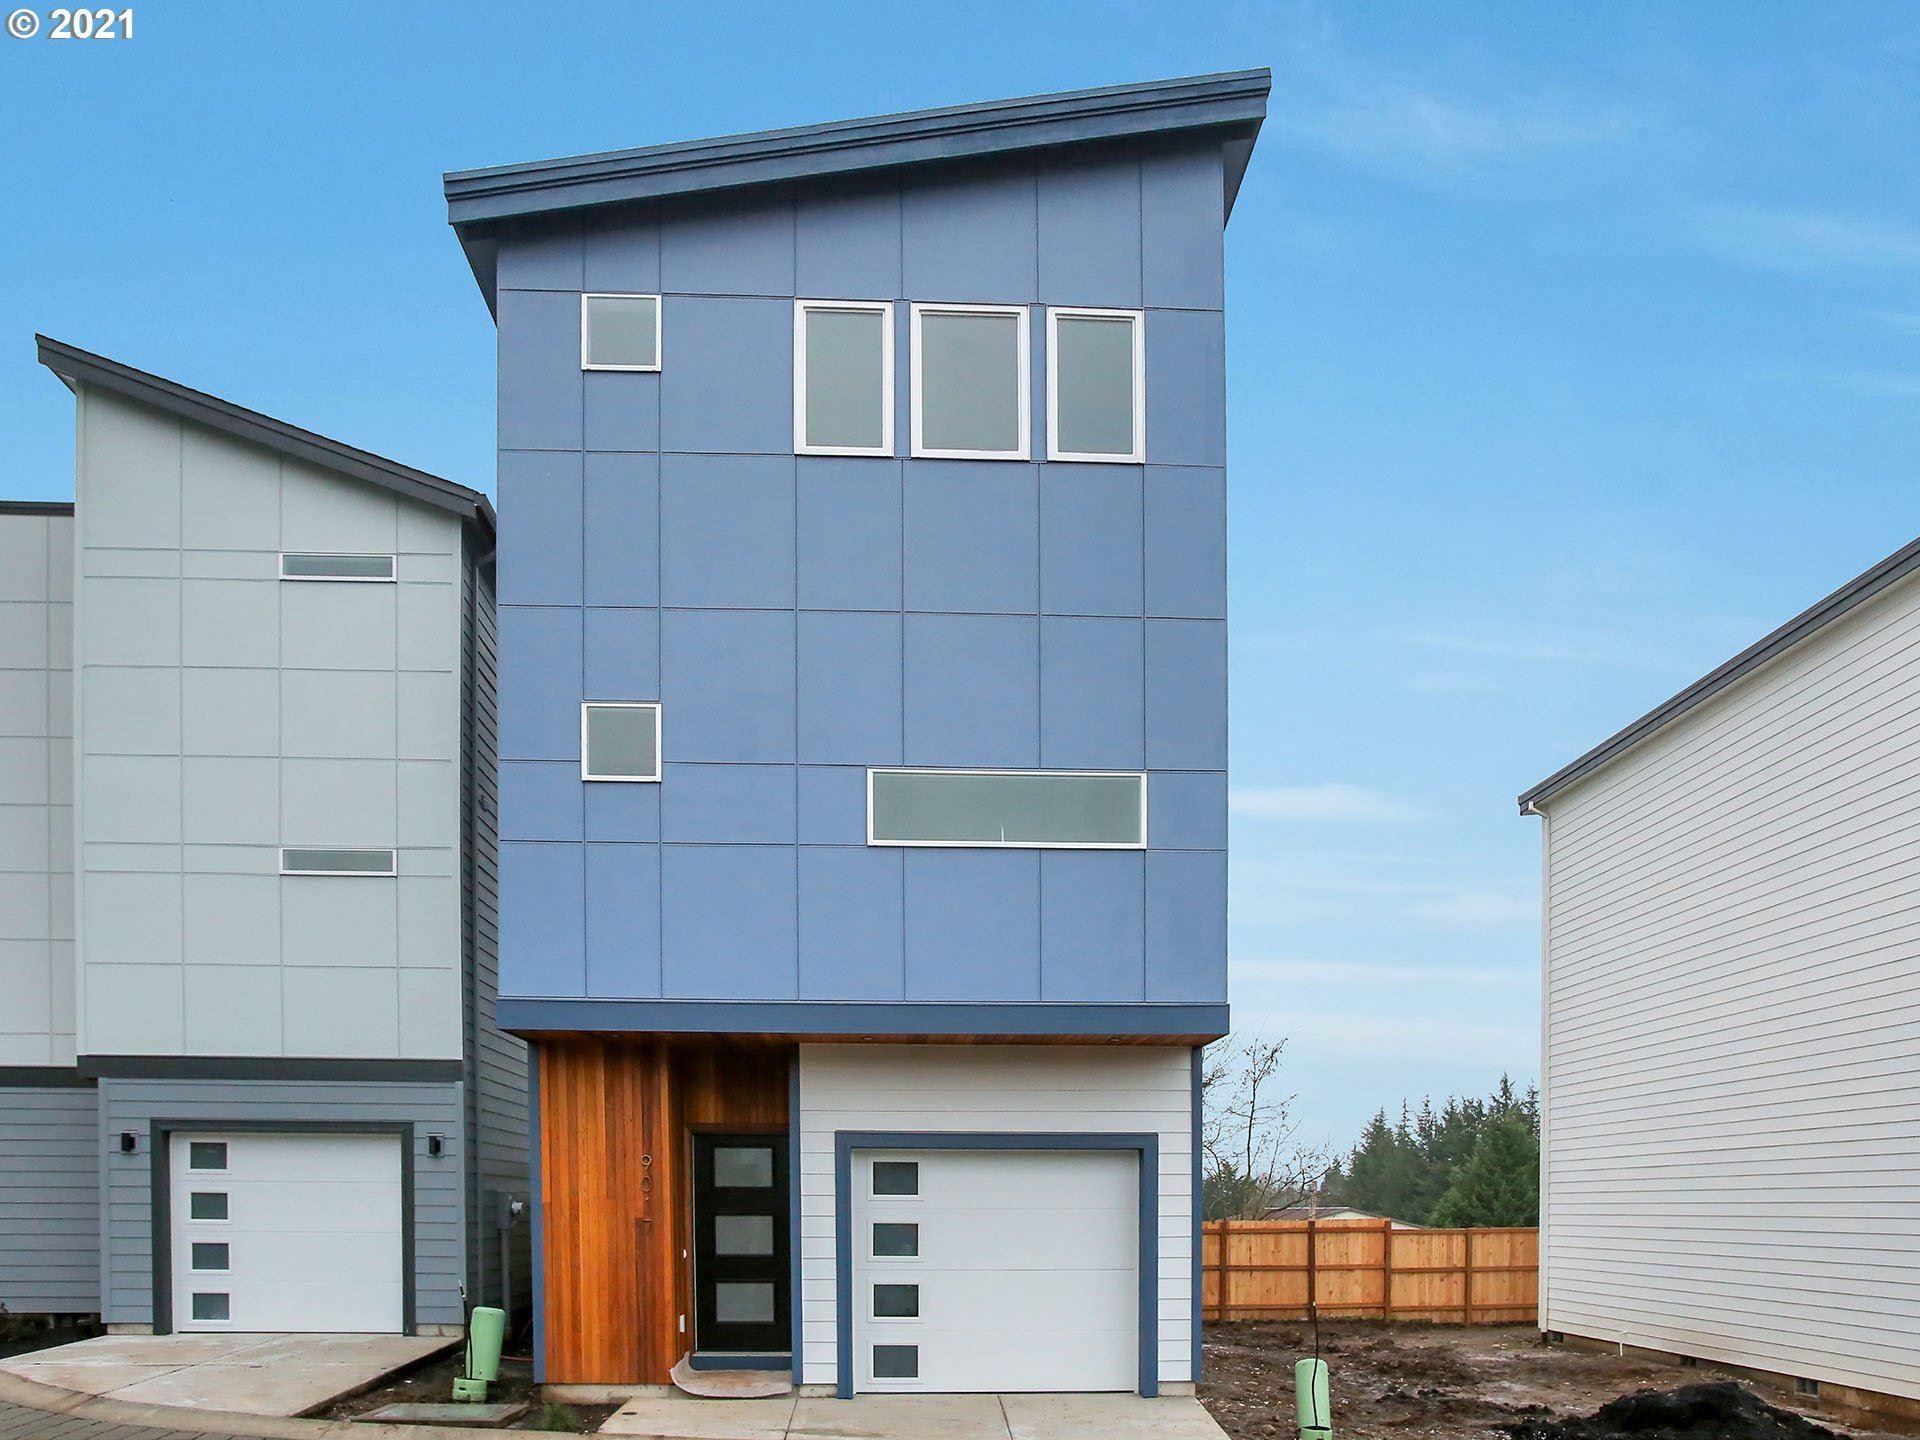 9017 NE Hoyt ST, Portland, OR 97220 - MLS#: 21184745